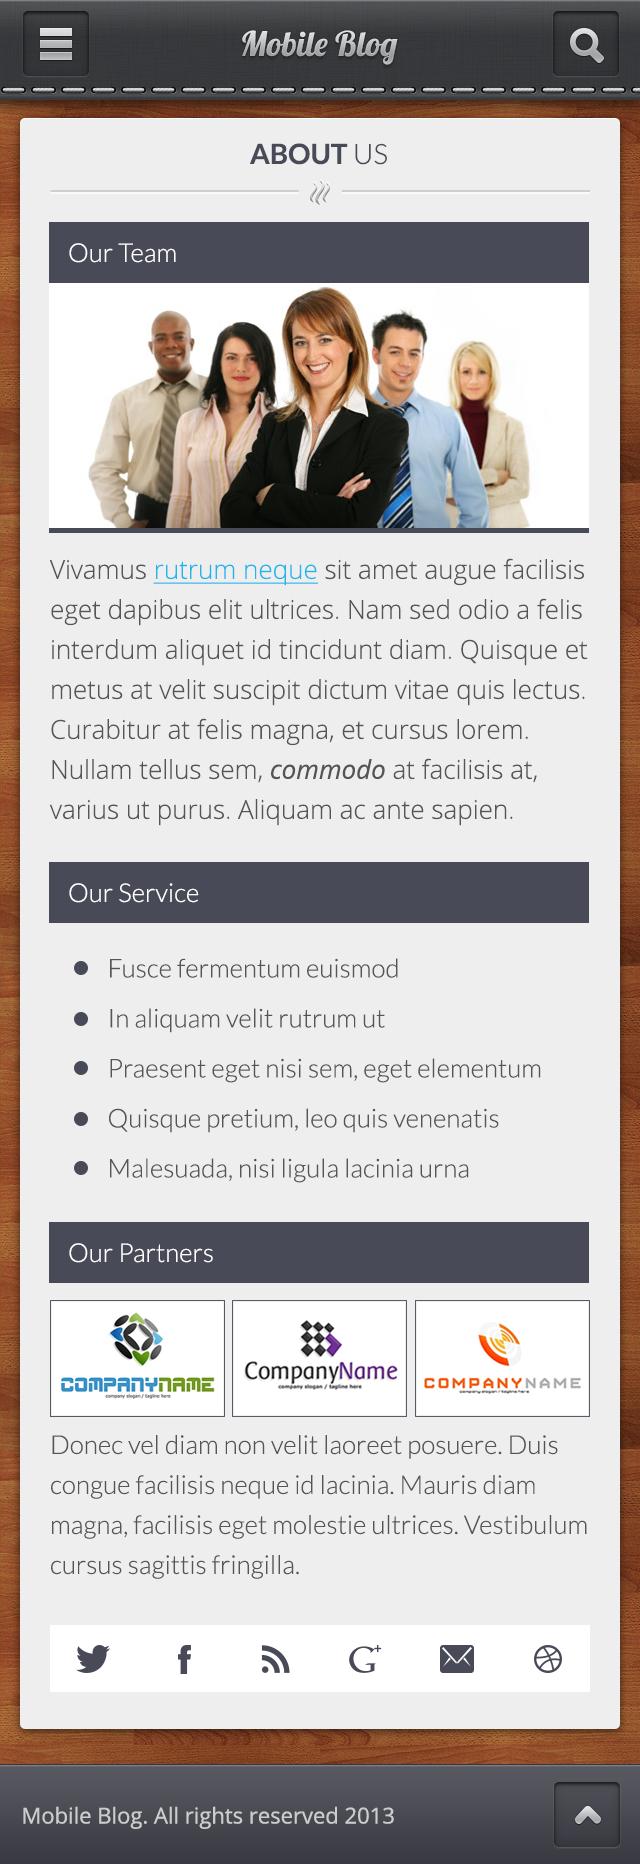 Mobile Blog PSD